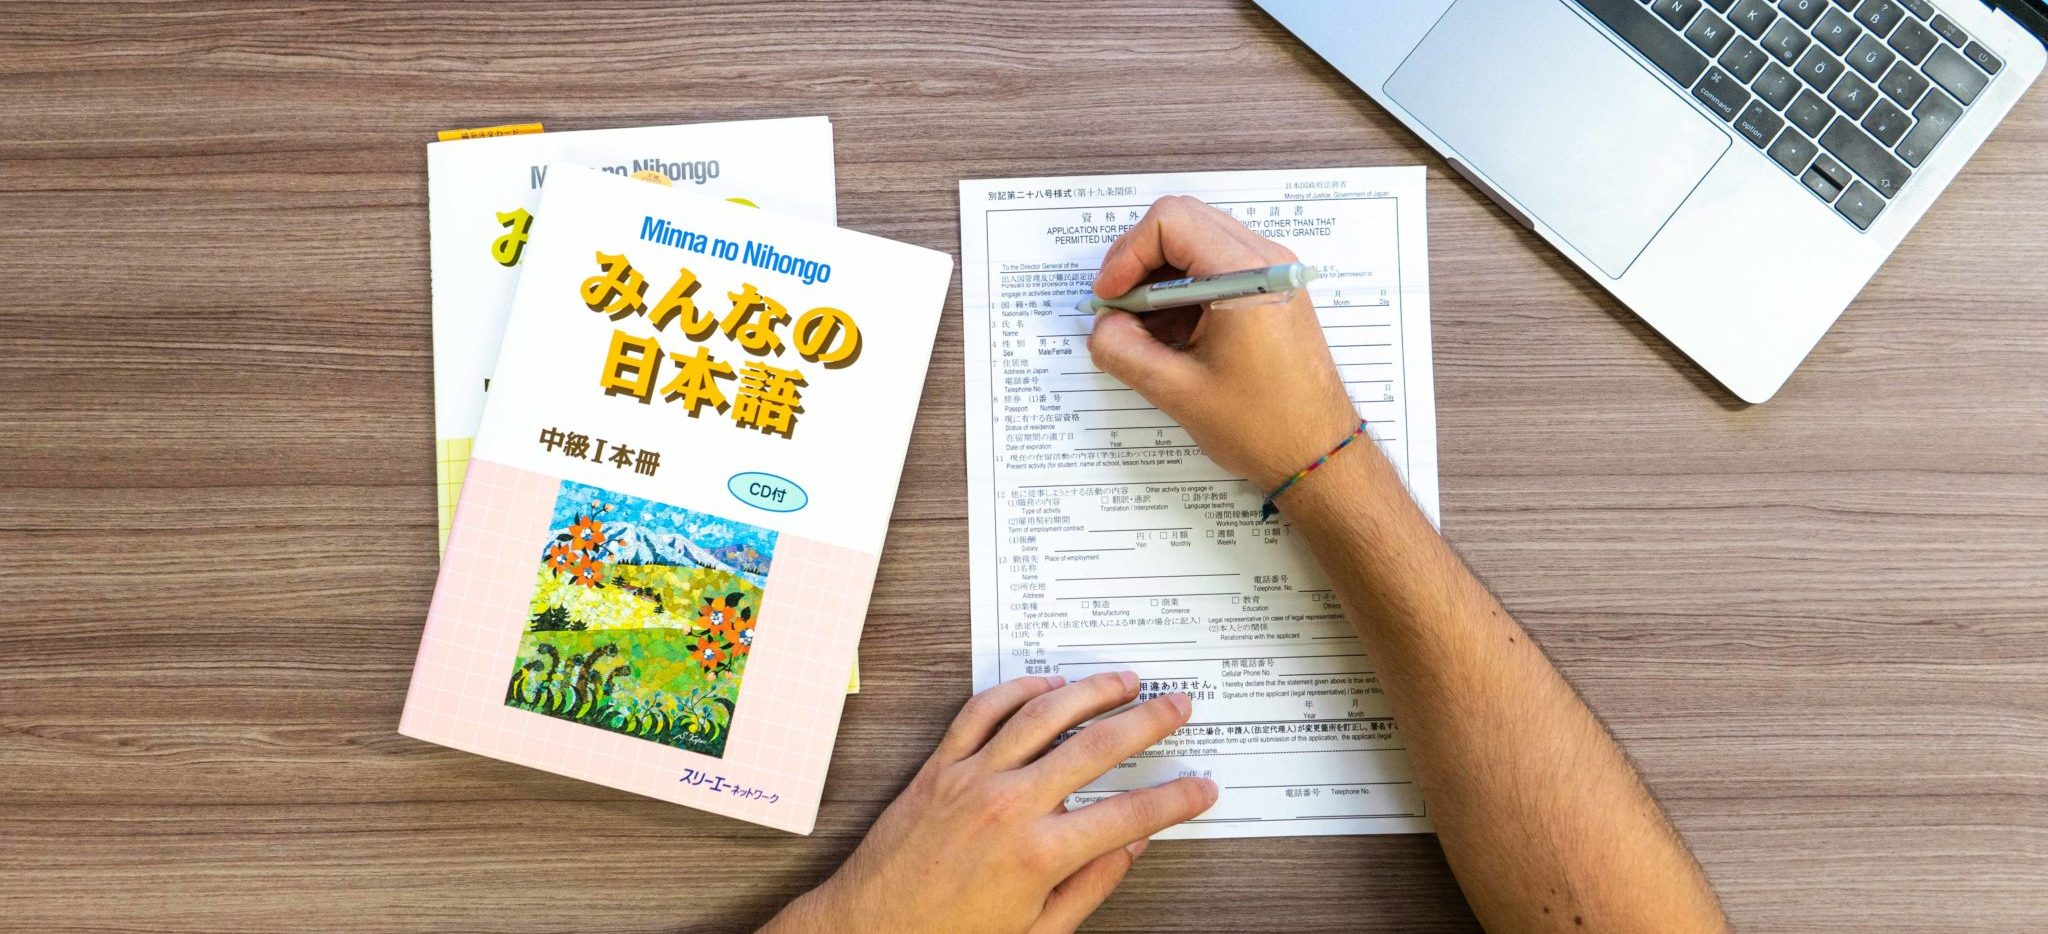 Work permit in Japan